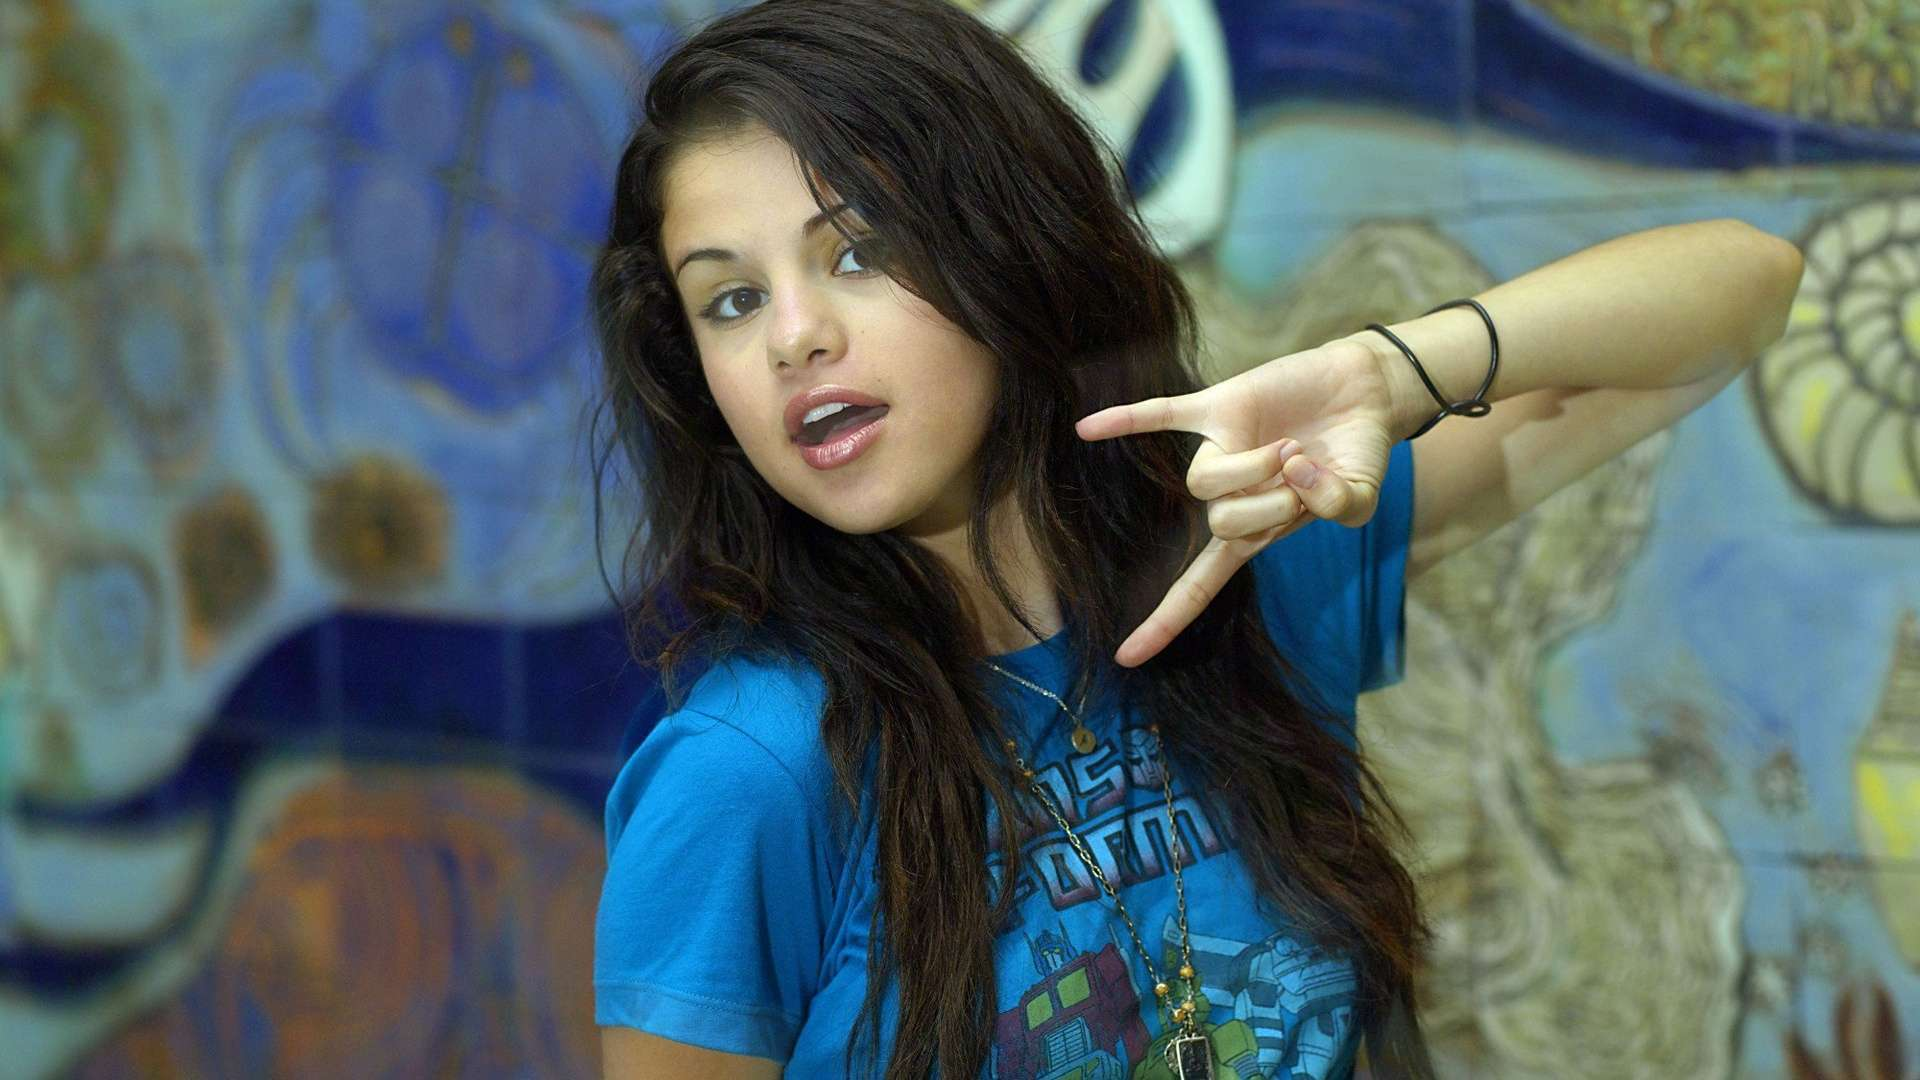 Selena Gomez HD Wallpapers Backgrounds Wallpaper 1920x1080